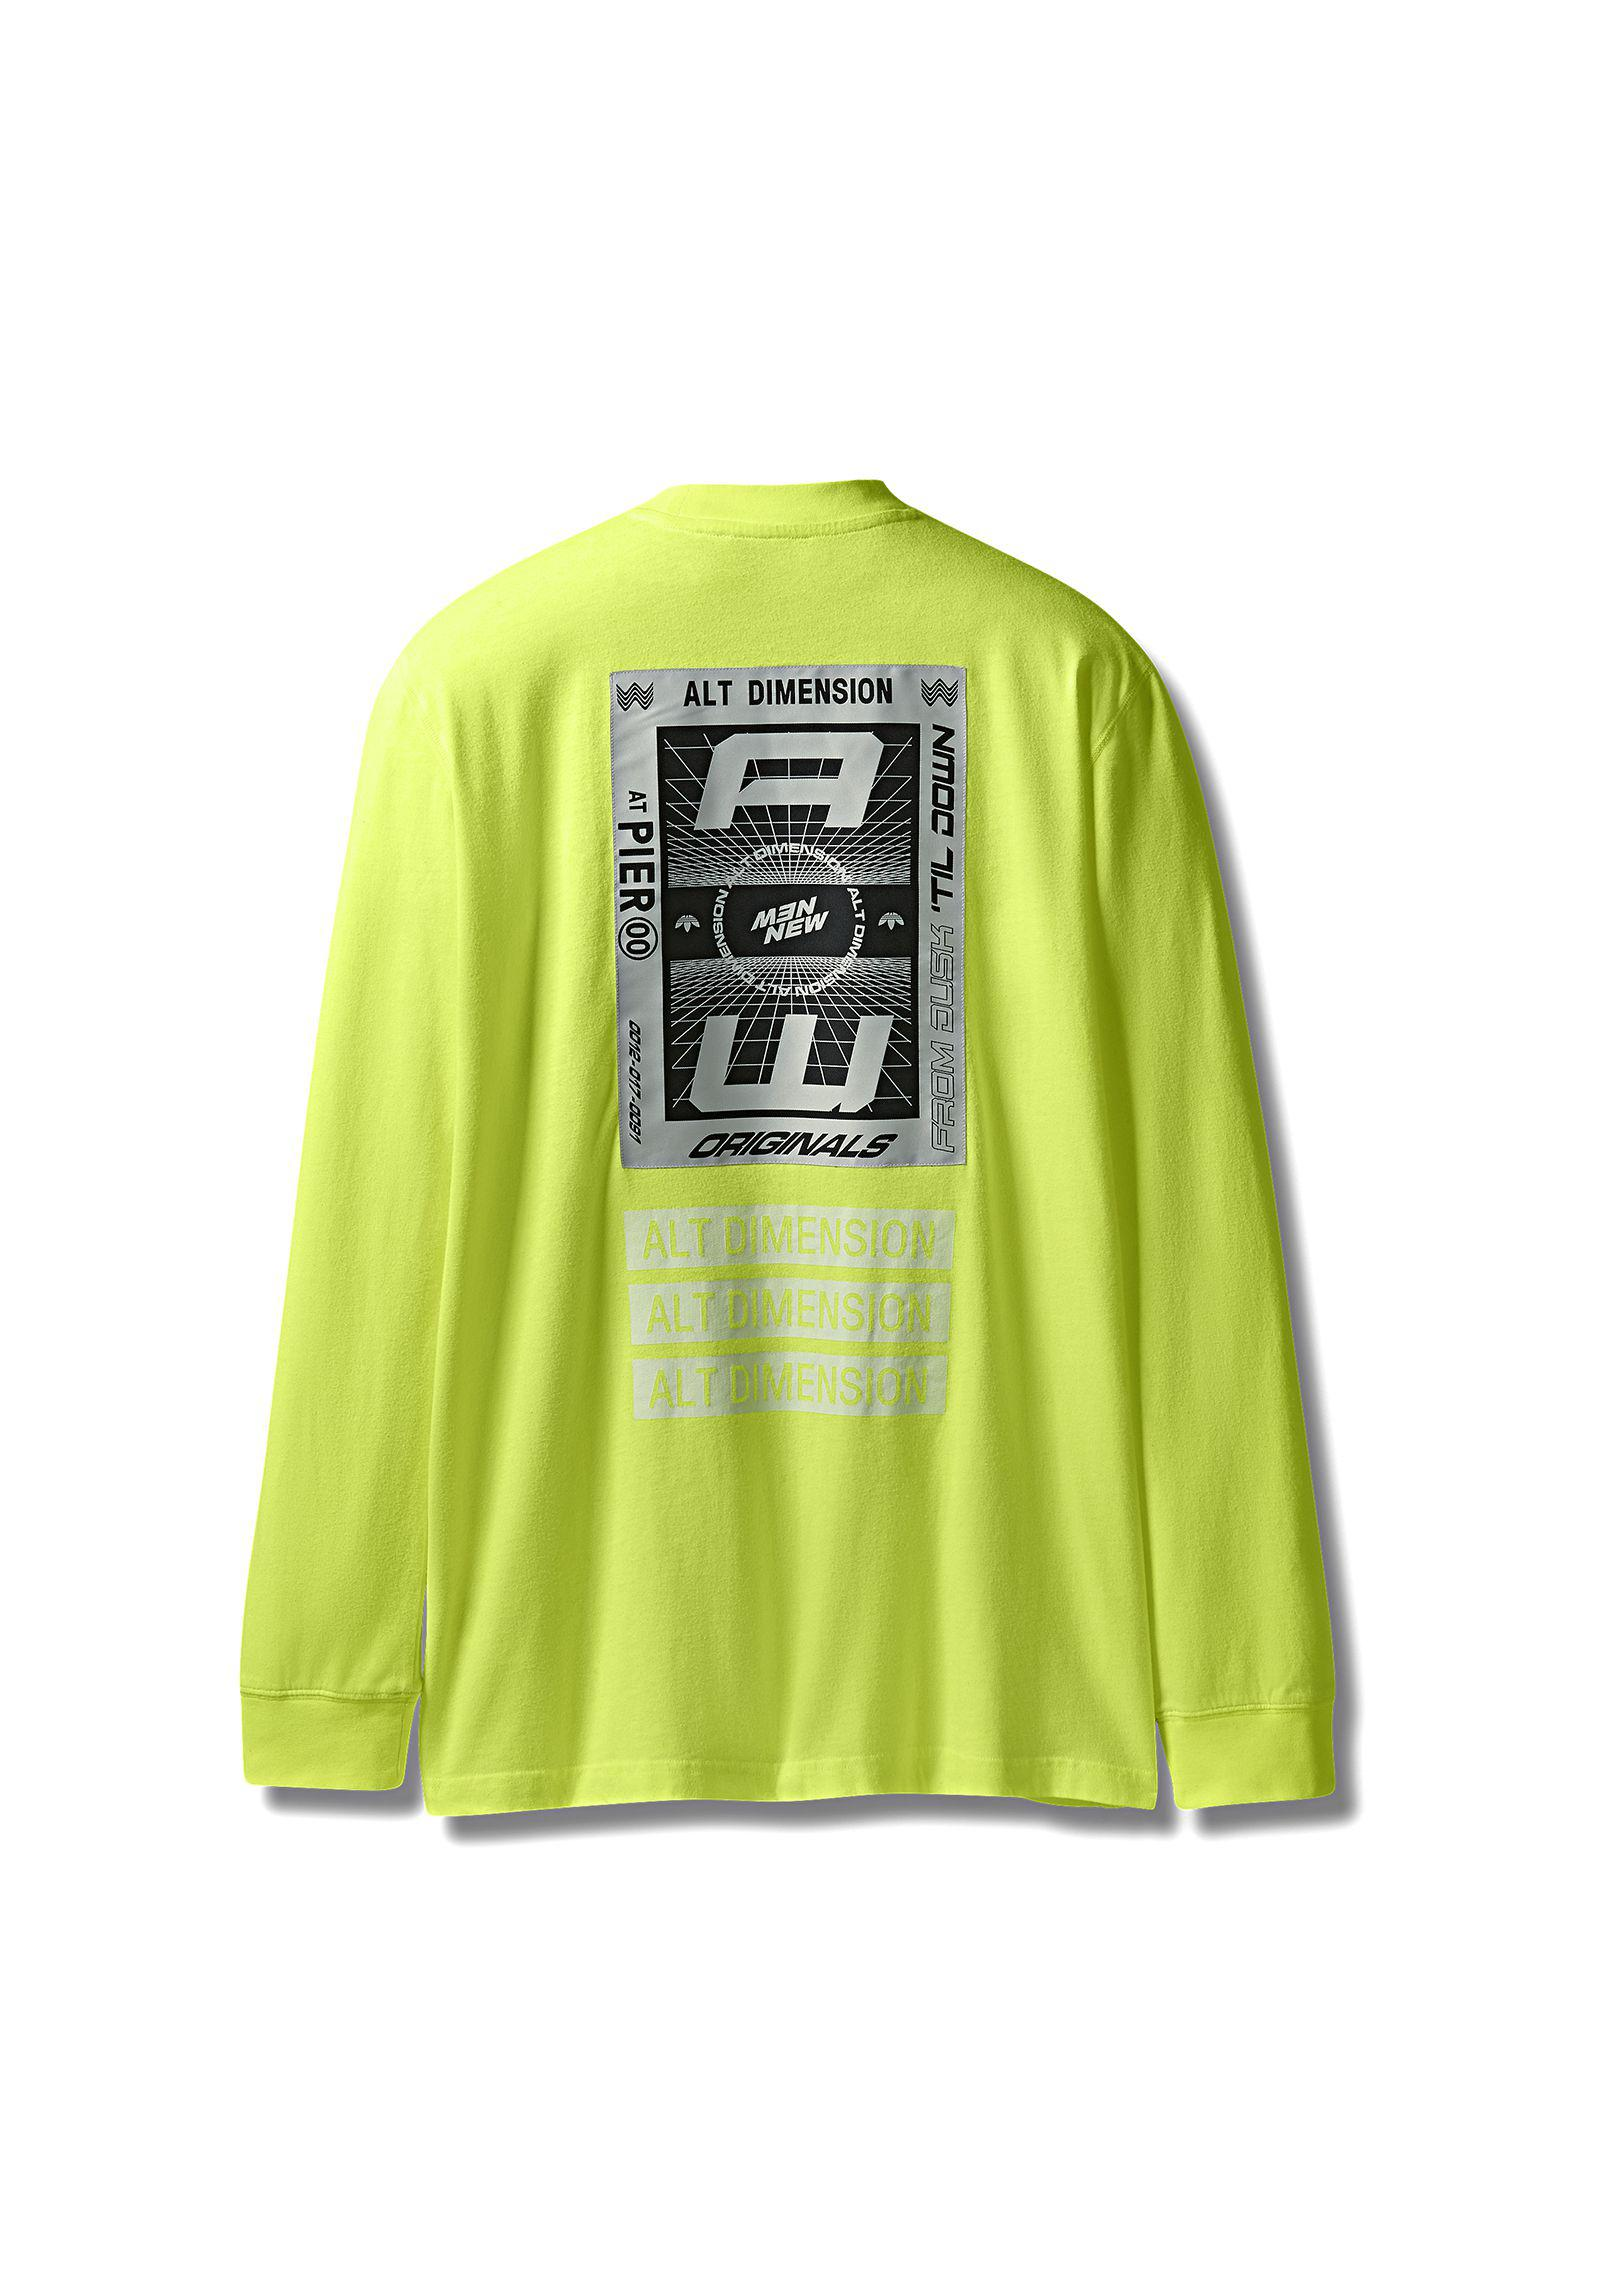 ecdb75b653b6 Alexander Wang Adidas Originals By Aw Bleach Long Sleeve Shirt in ...